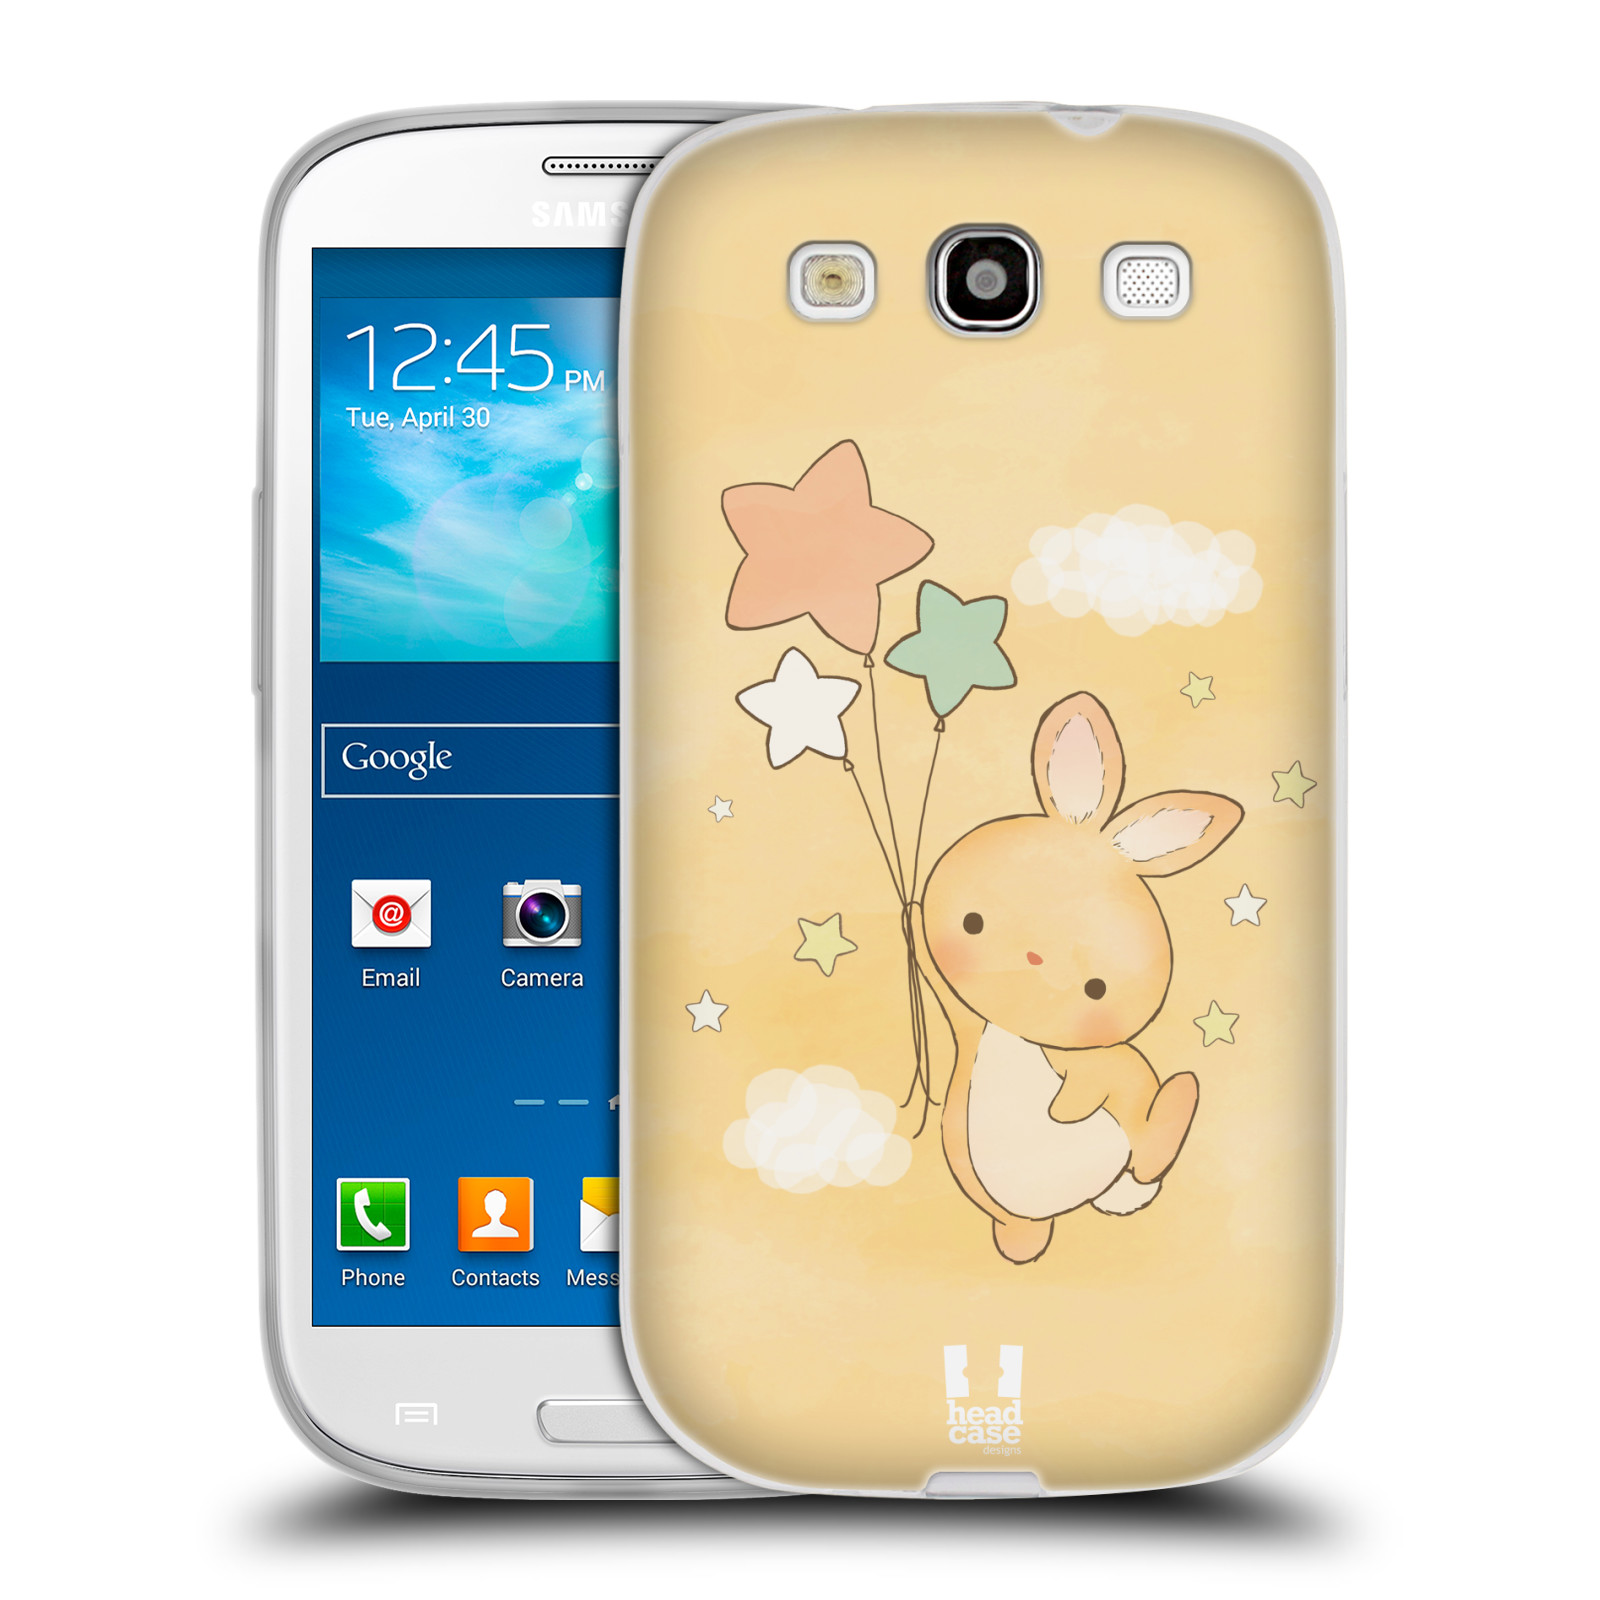 HEAD CASE silikonový obal na mobil Samsung Galaxy S3 i9300 vzor králíček a hvězdy žlutá